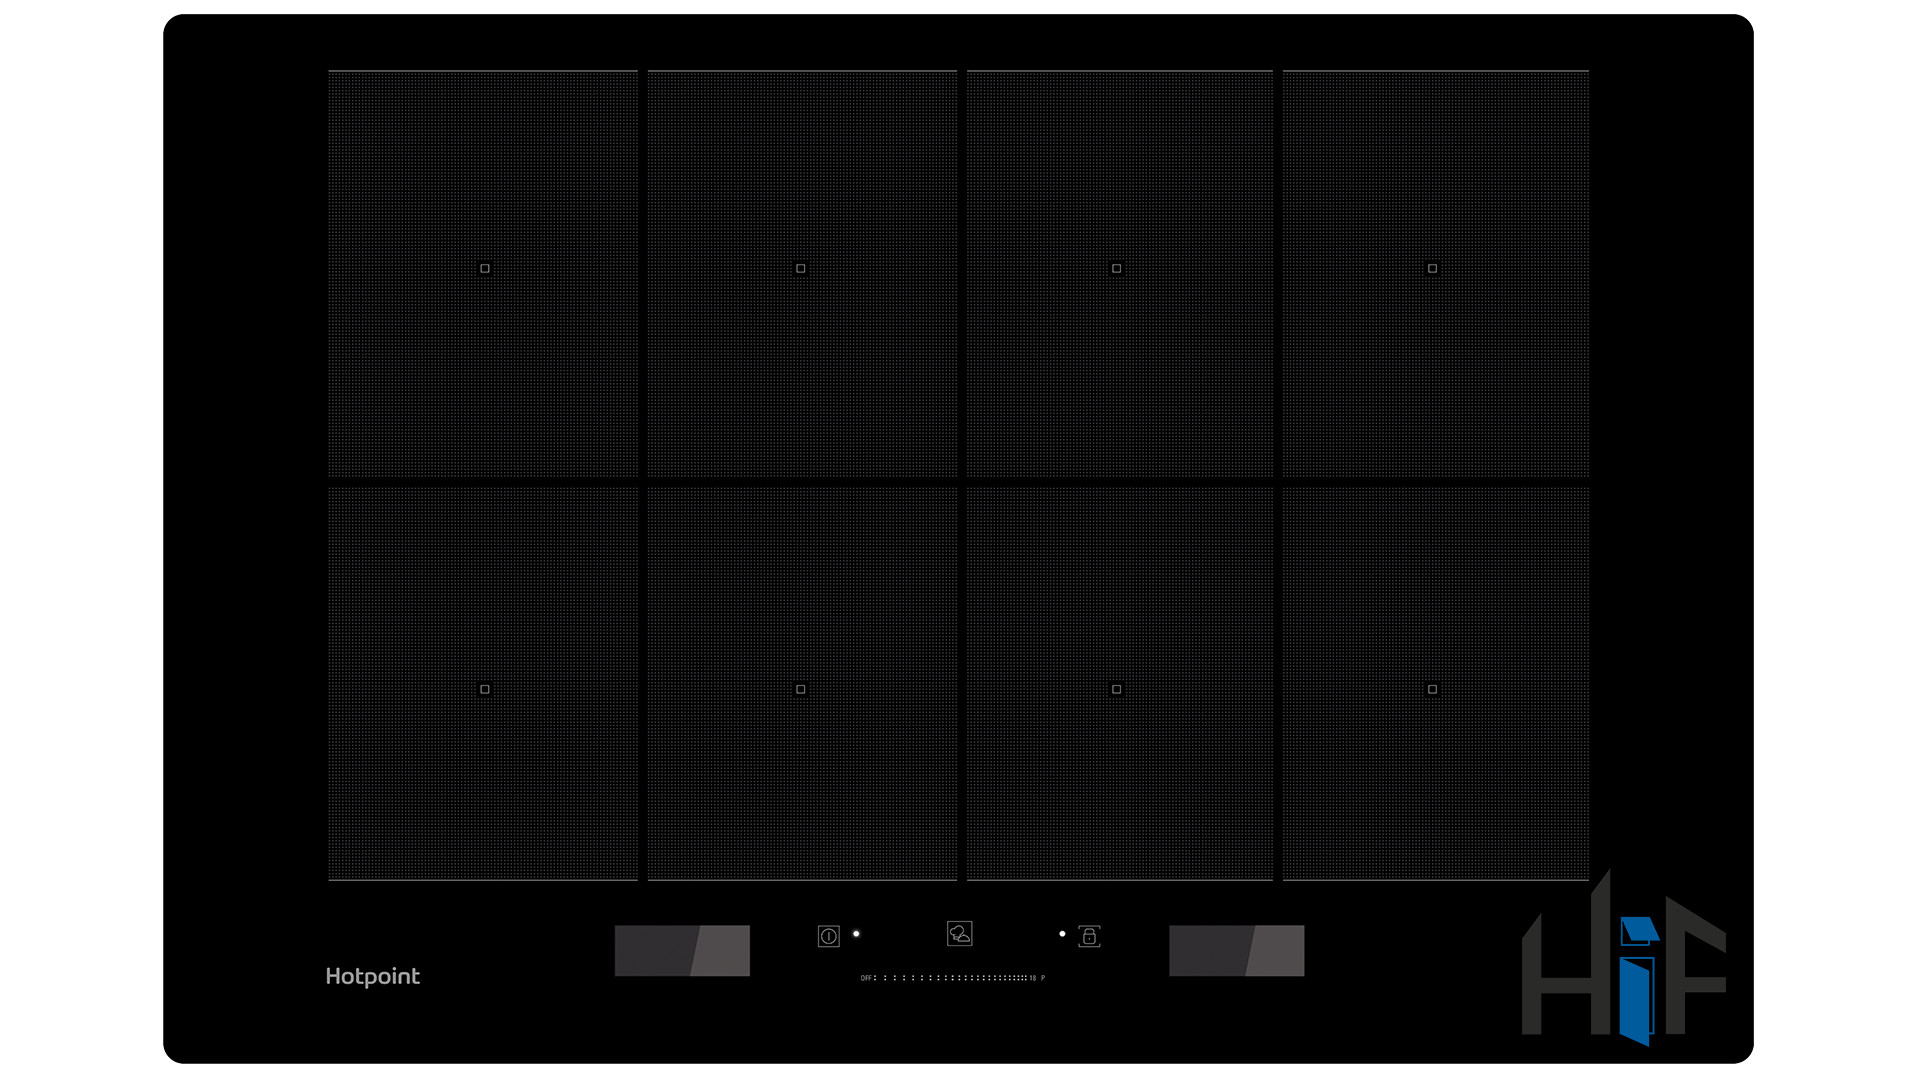 Hotpoint ACP778CBA 77cm Flex Pro Induction Hob